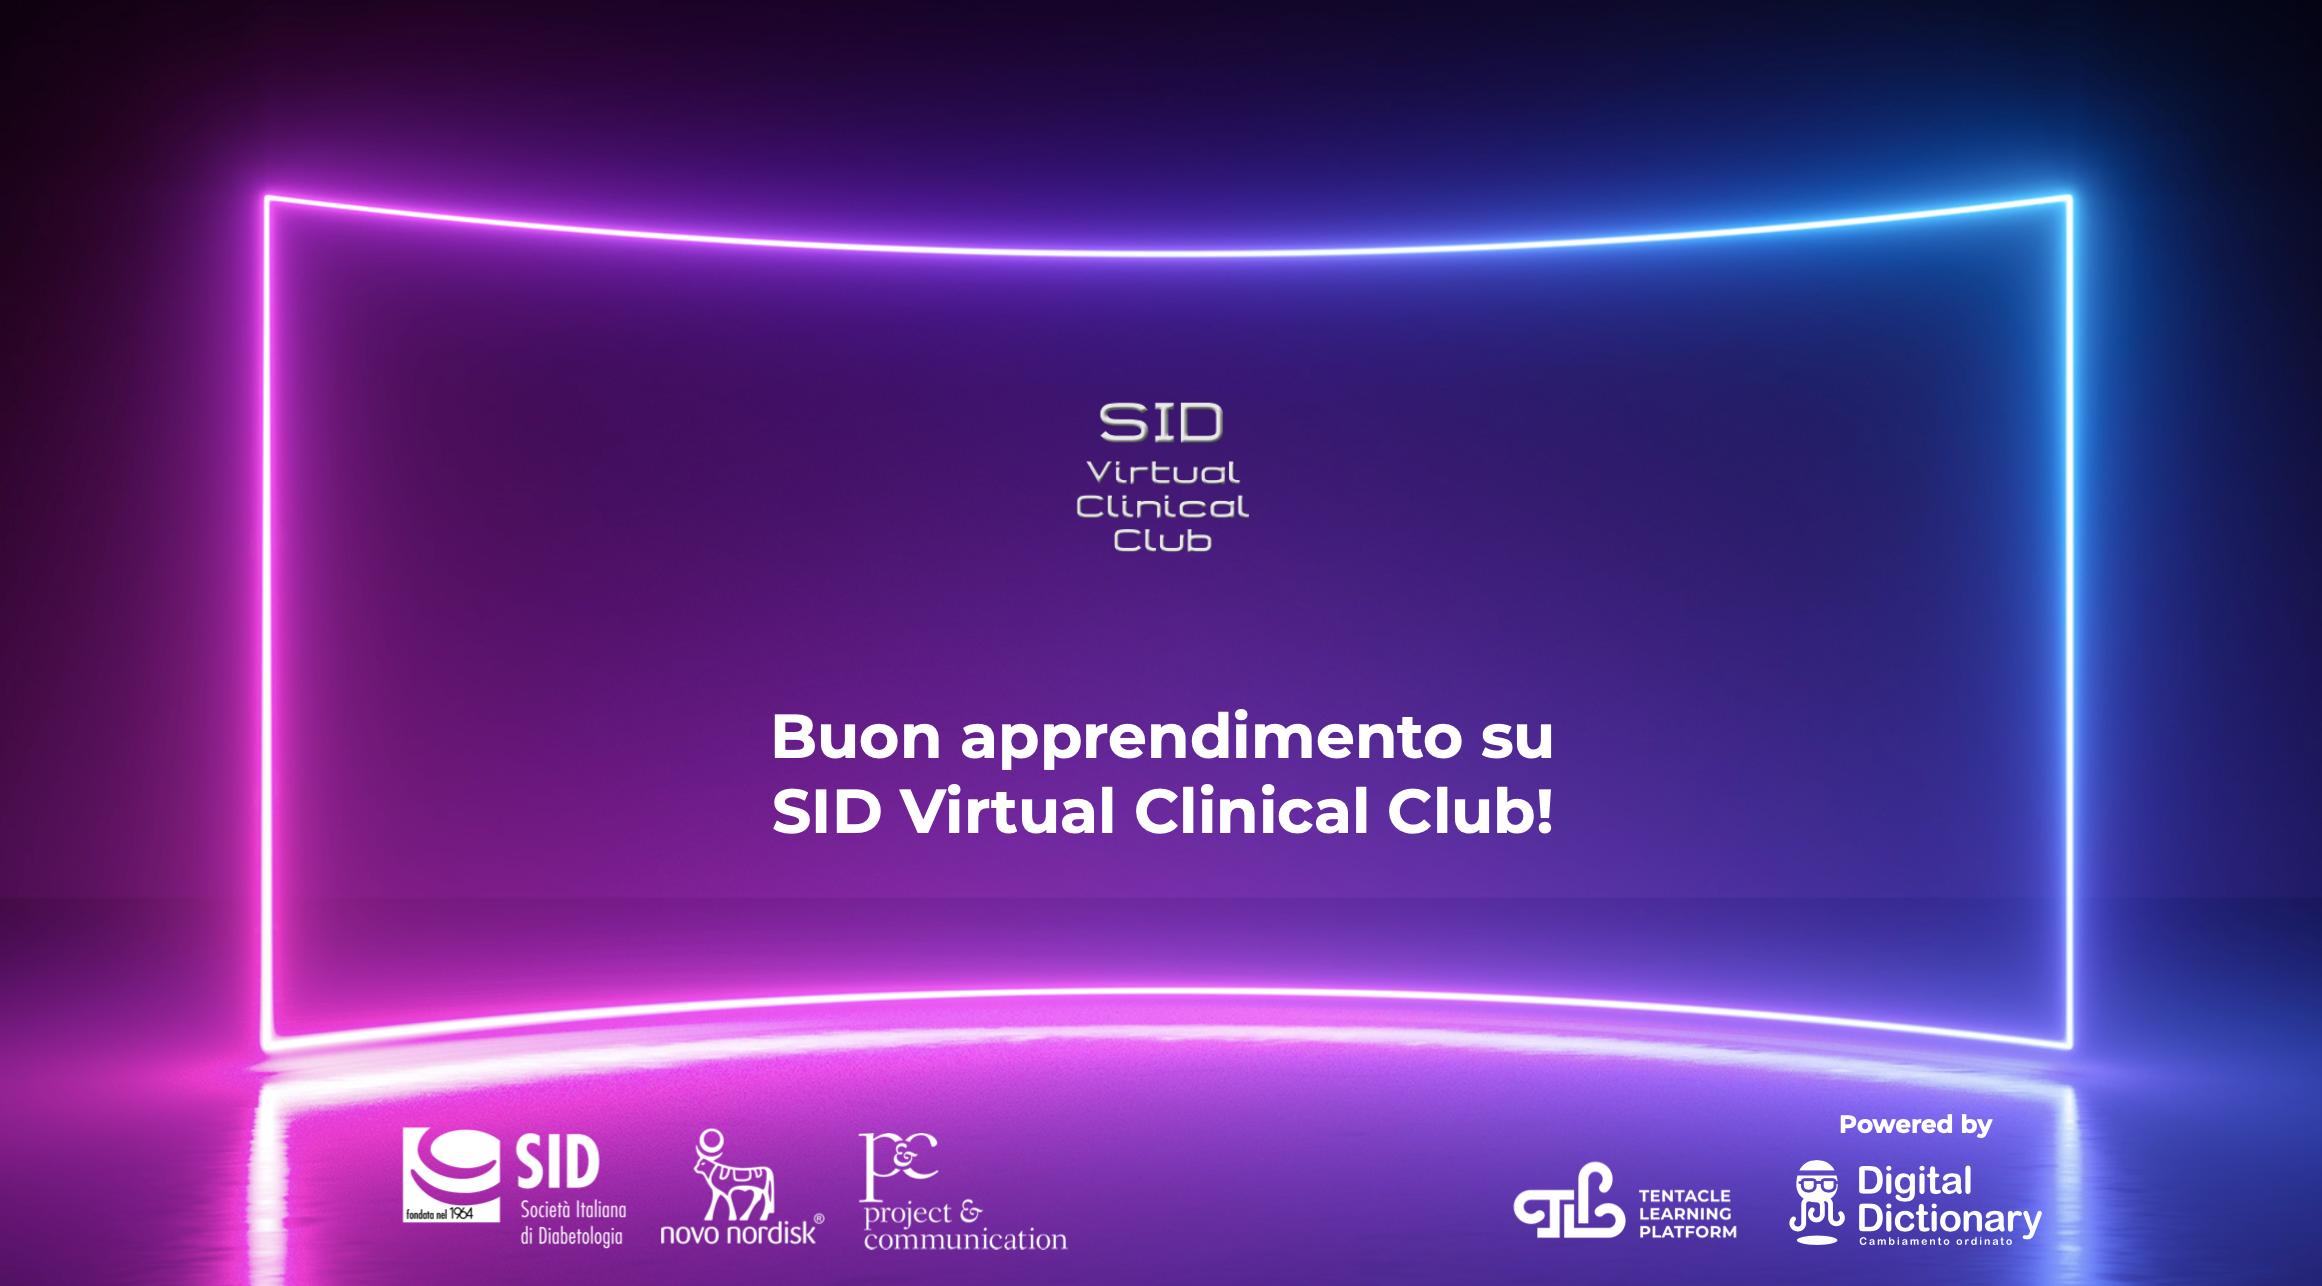 SID Virtual Clinical Club